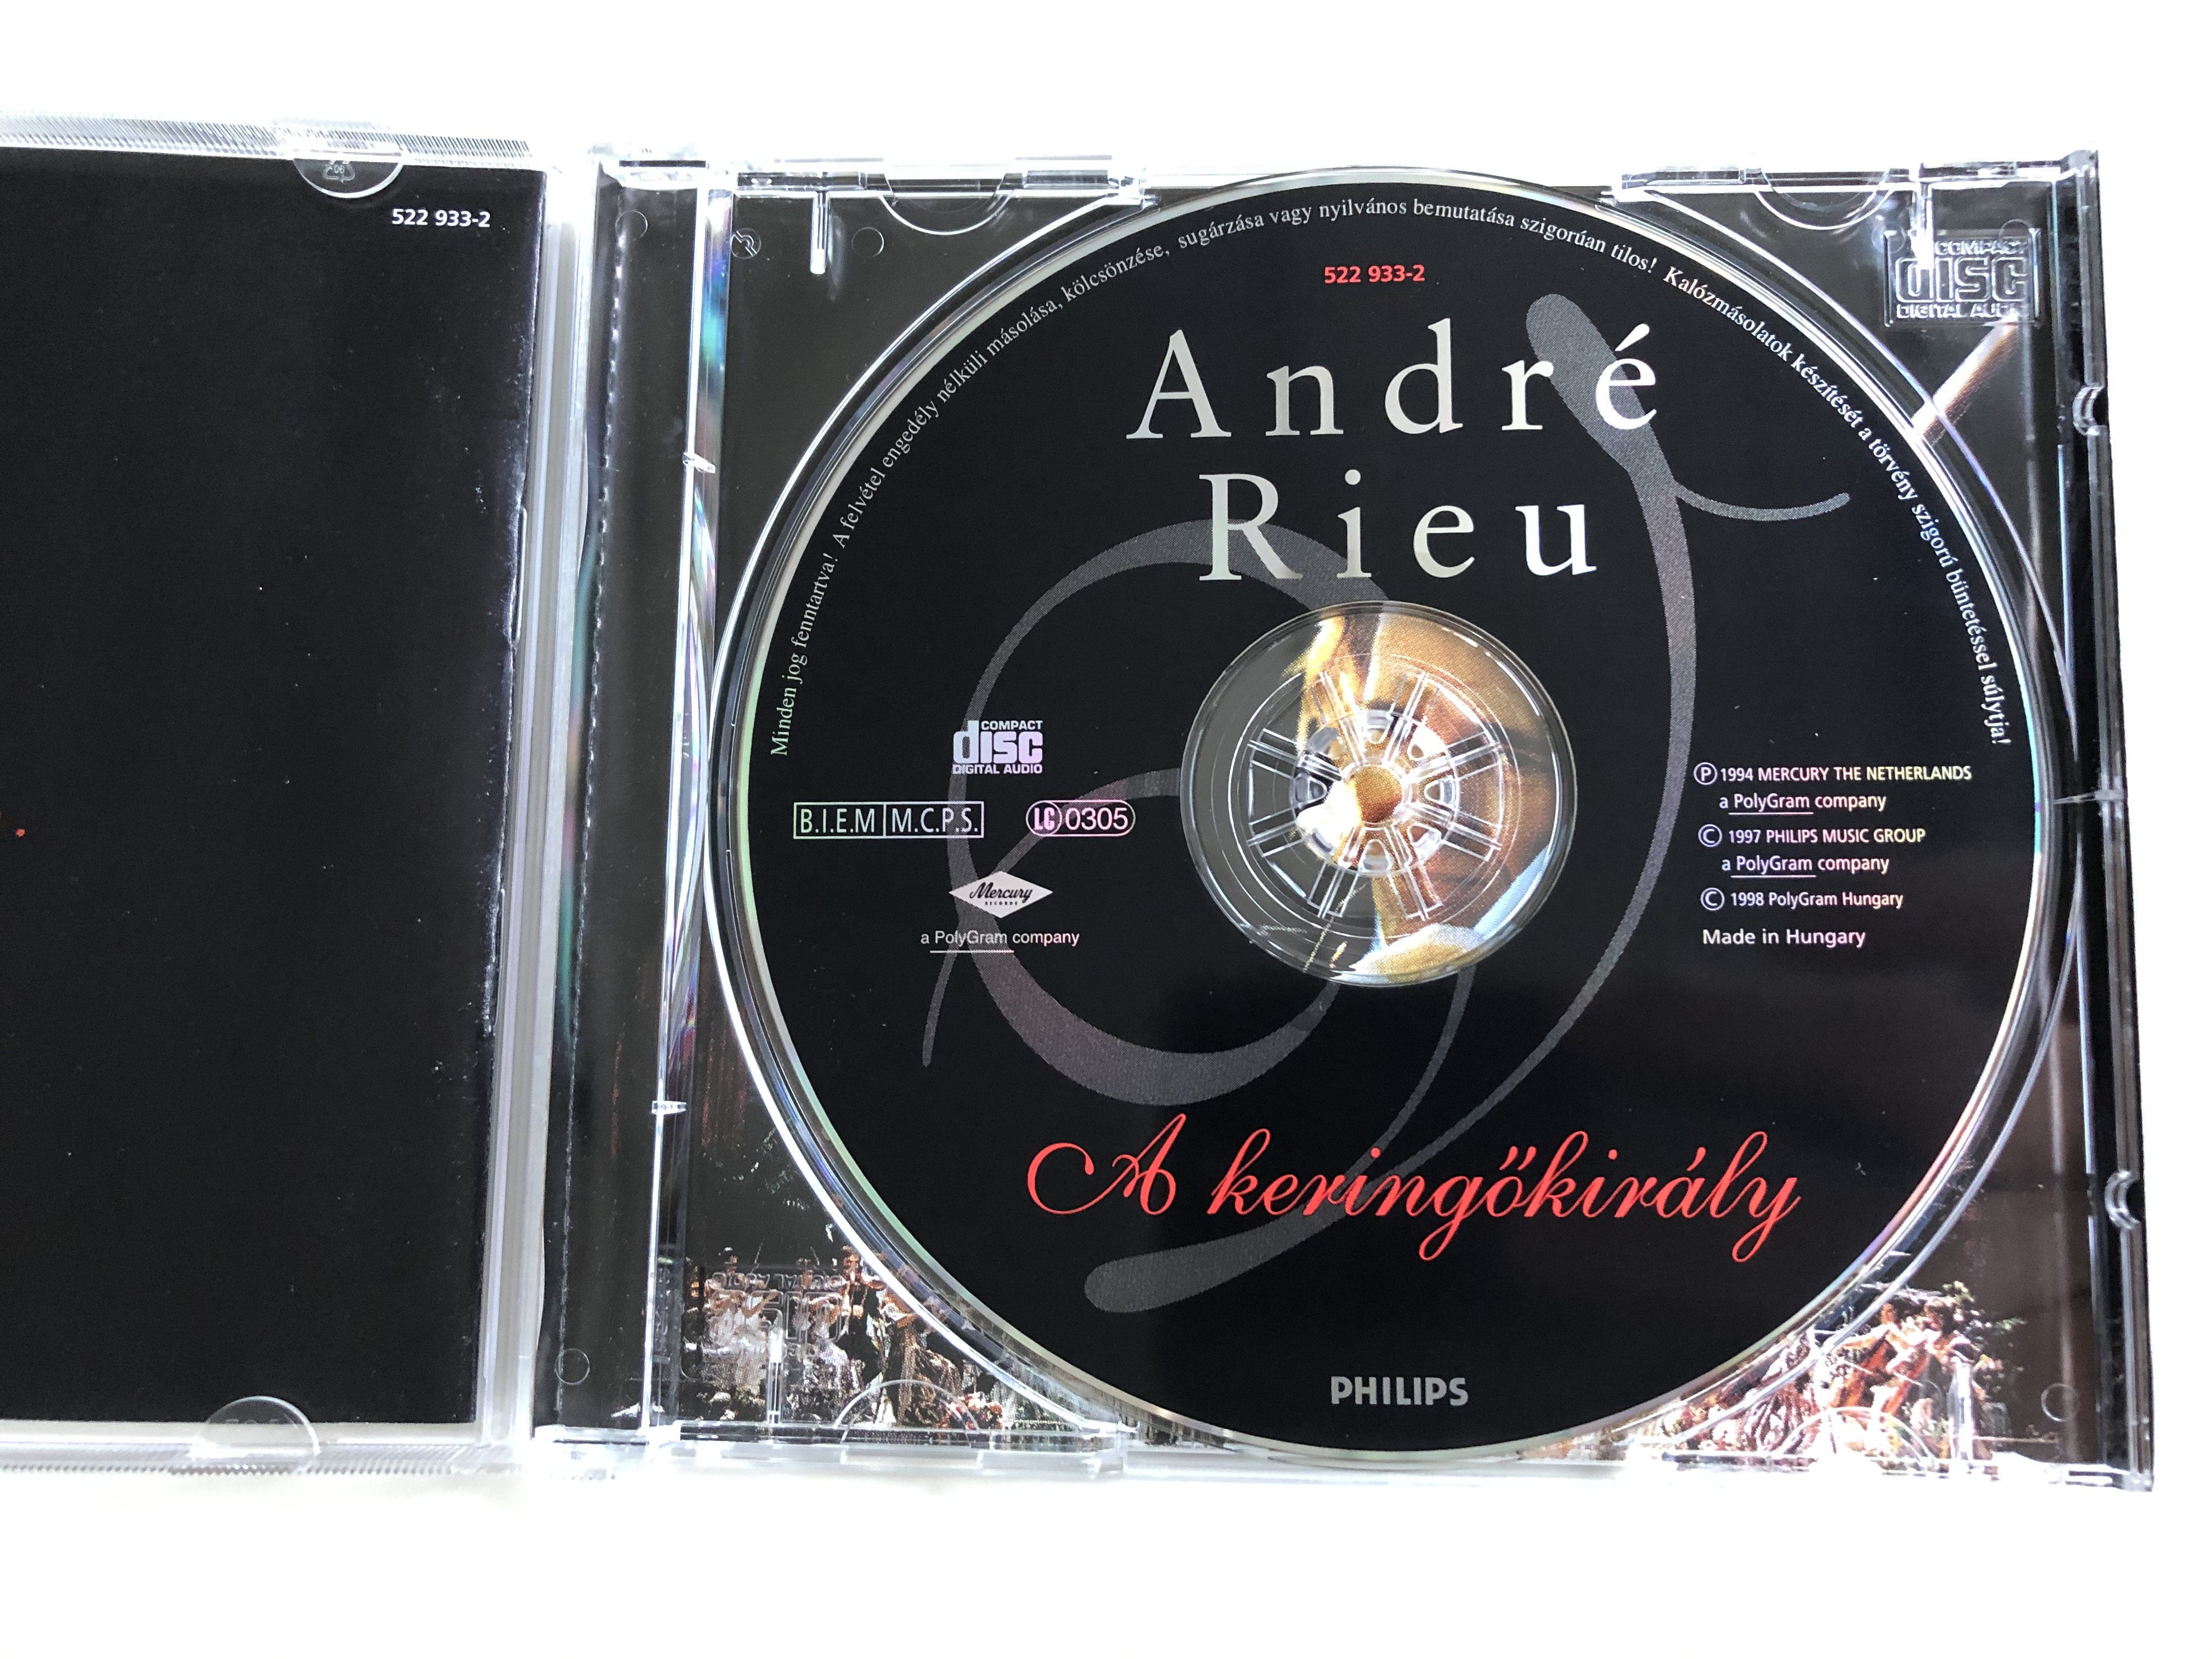 andr-rieu-a-keringokiraly-philips-audio-cd-1998-522-933-2-2-.jpg